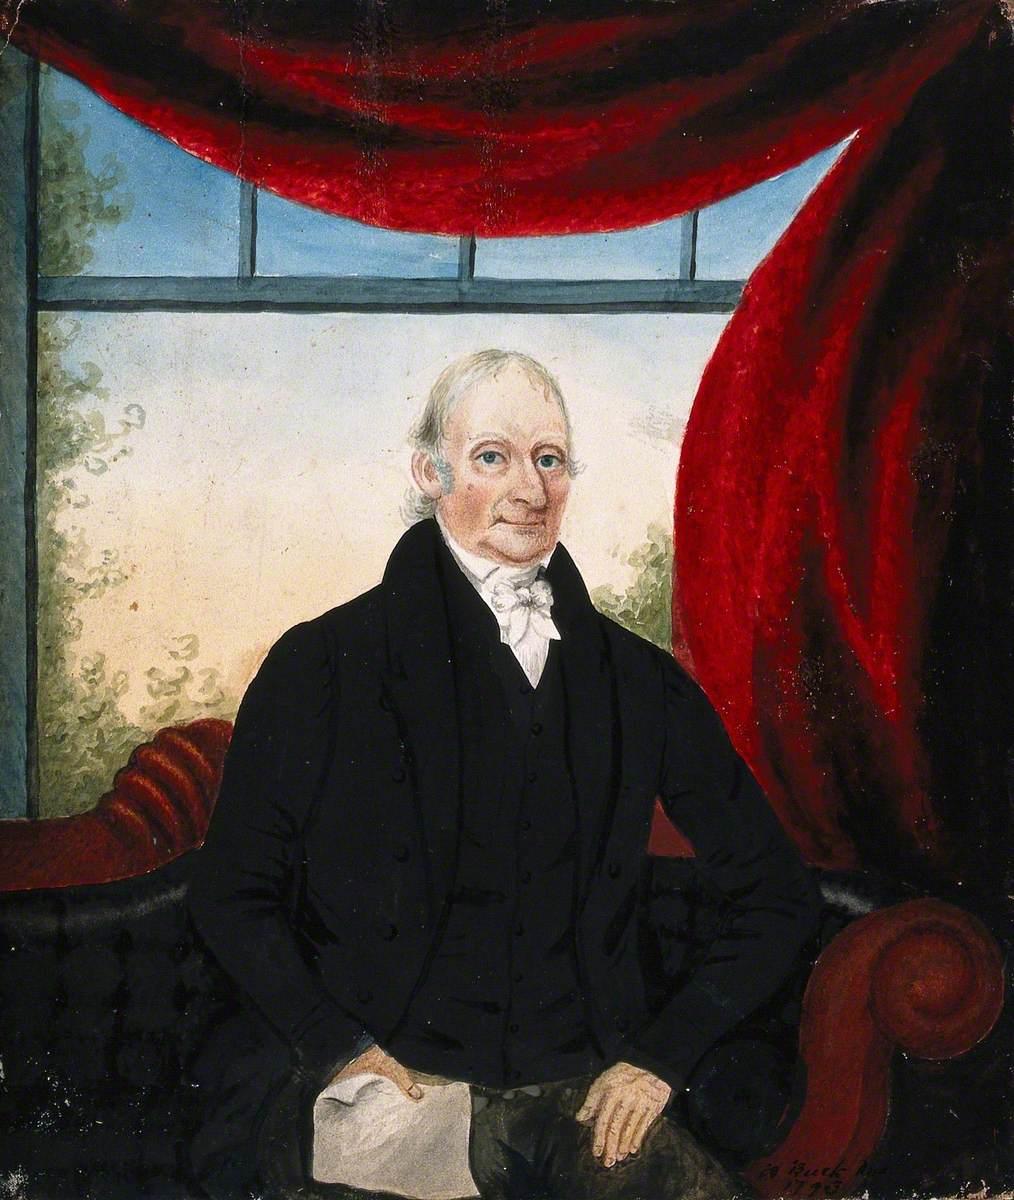 Адам Бак - Портрет аристократа, 1793